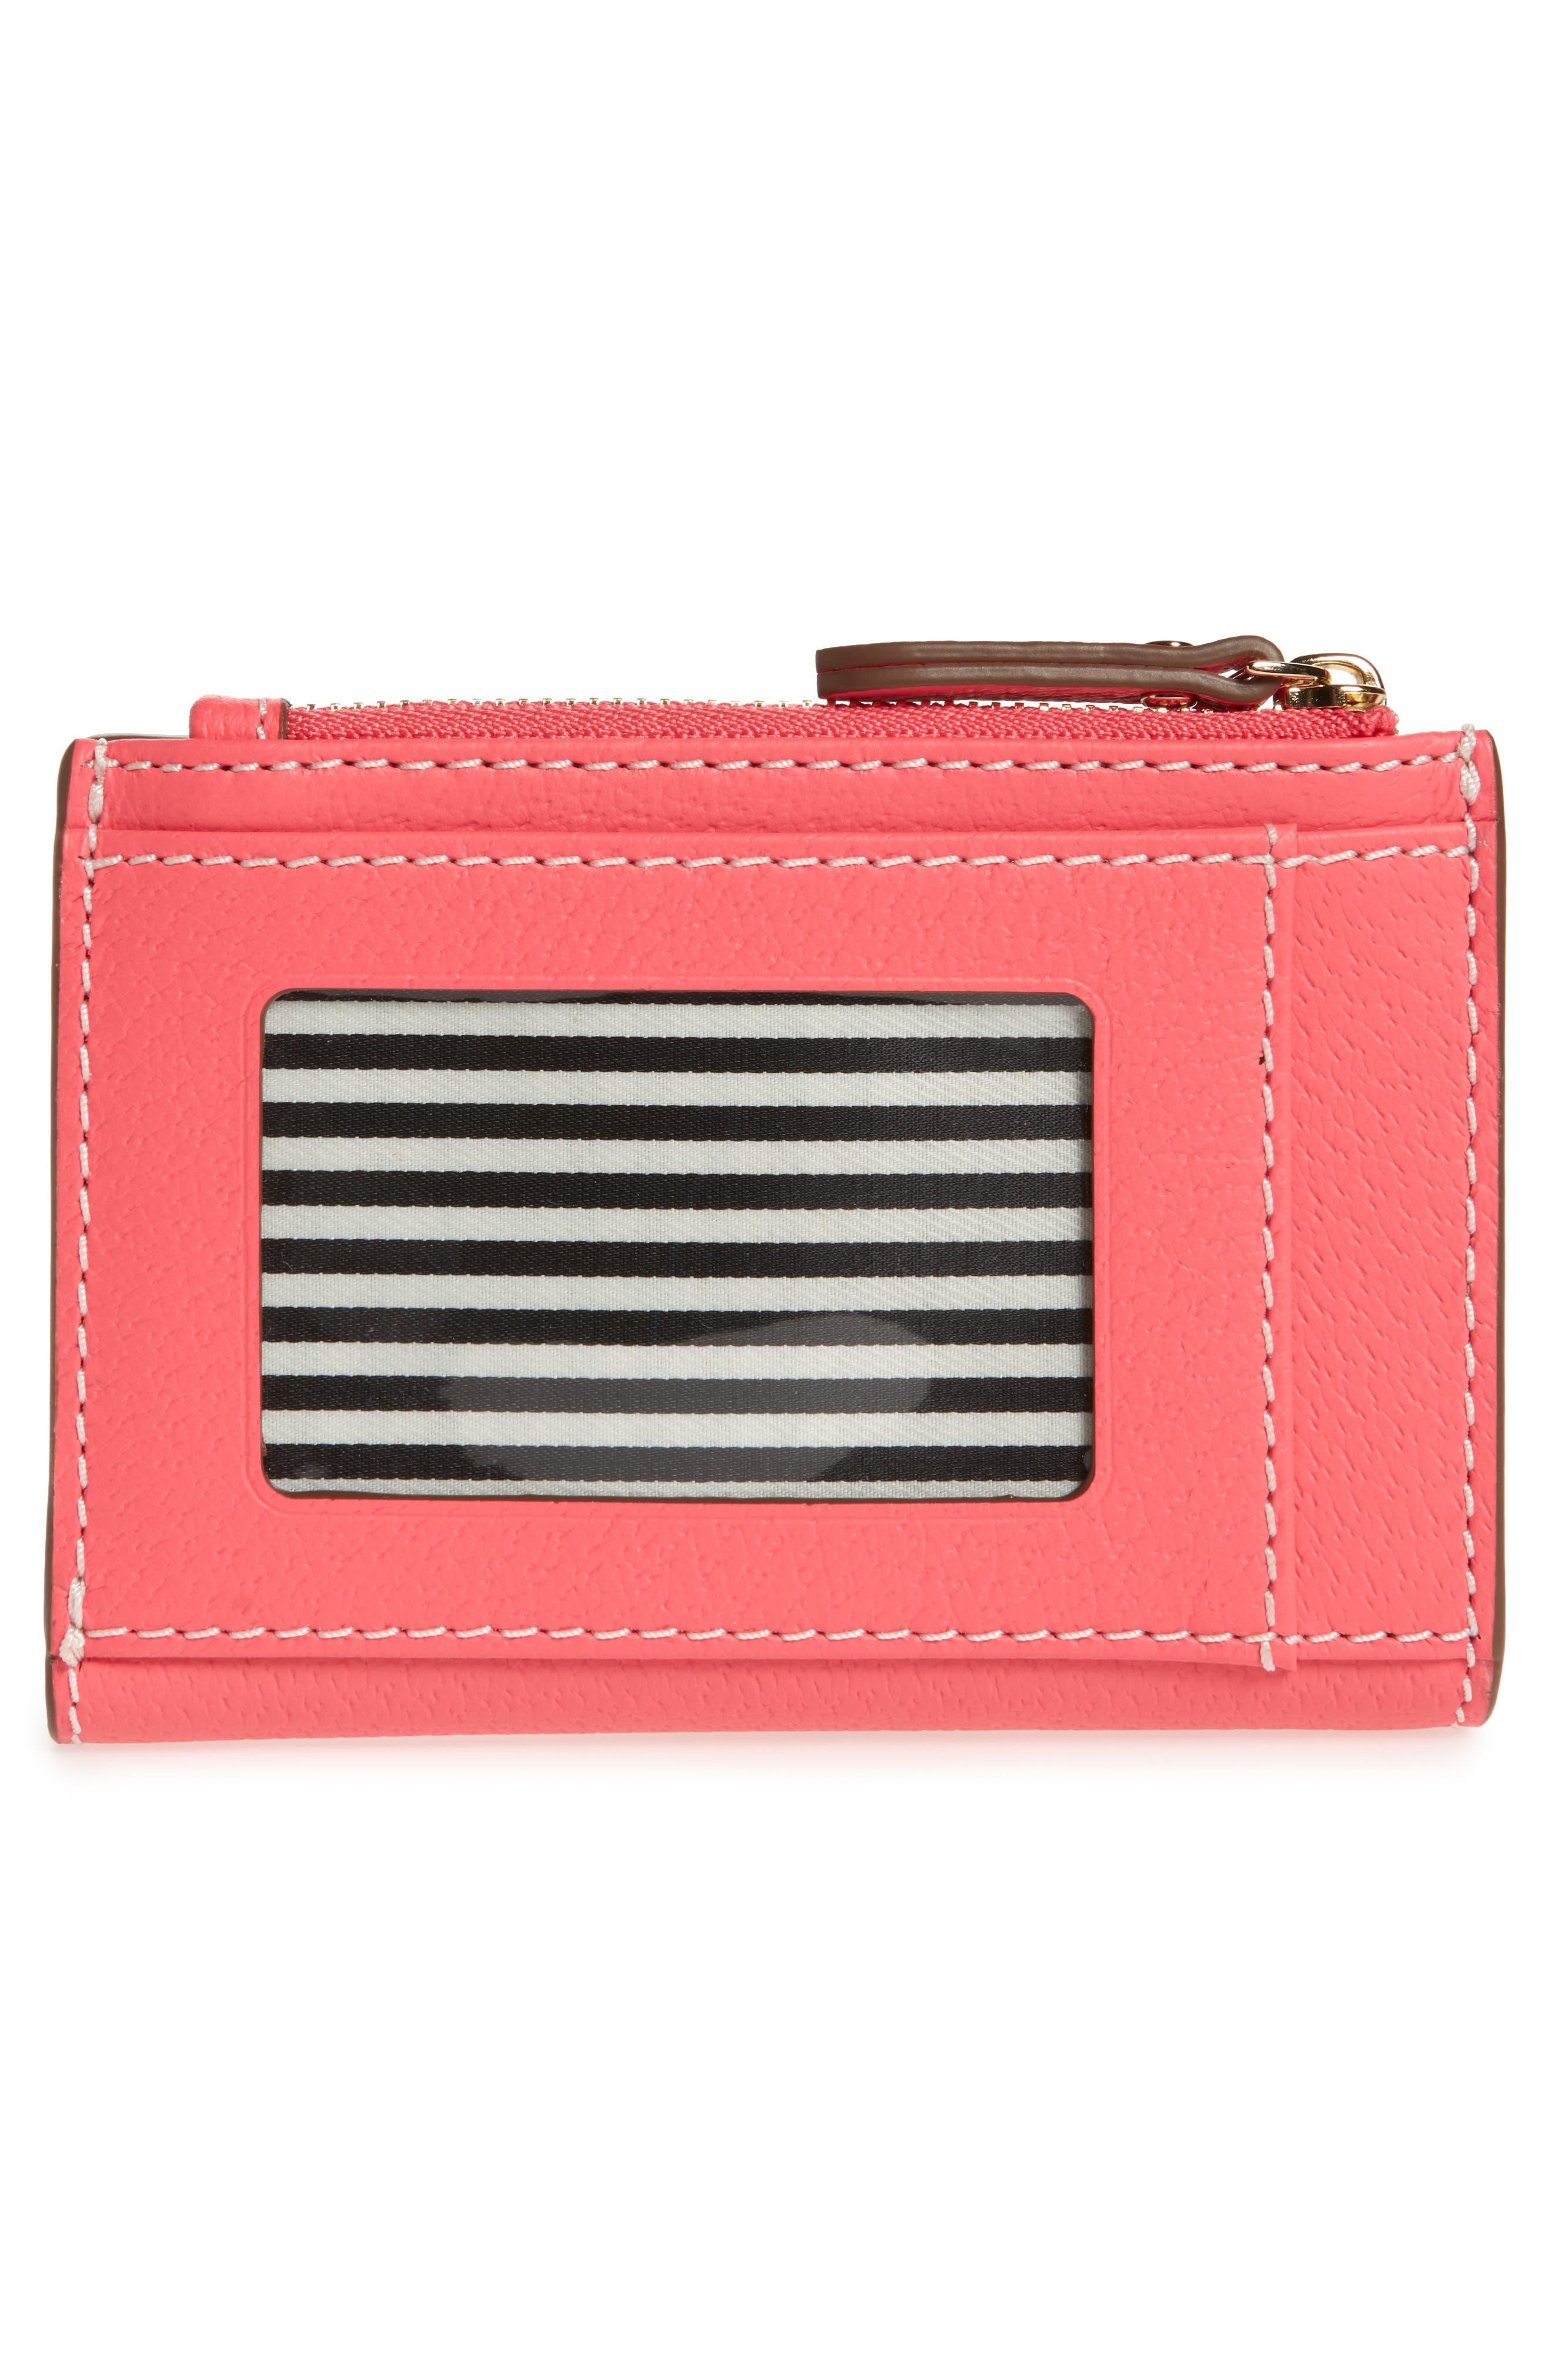 thompson street – abri leather wallet,                             Alternate thumbnail 4, color,                             Bright Flamingo